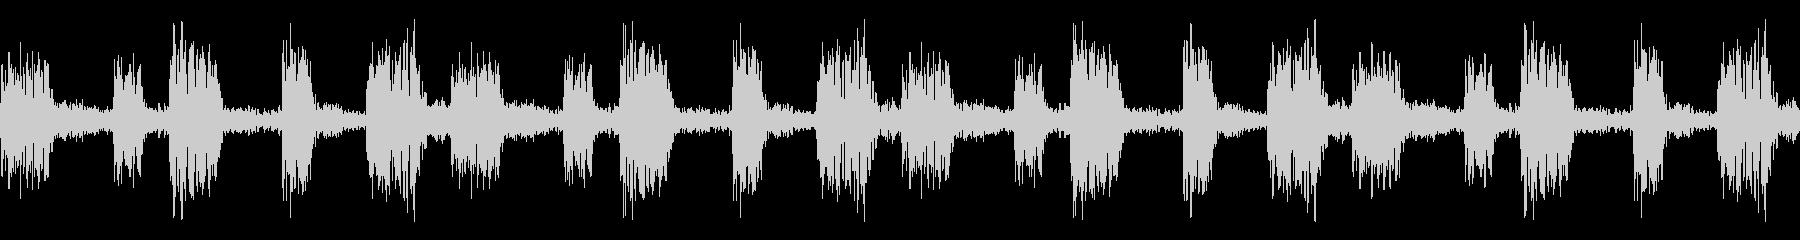 House コードシンセ 1 音楽制作用の未再生の波形